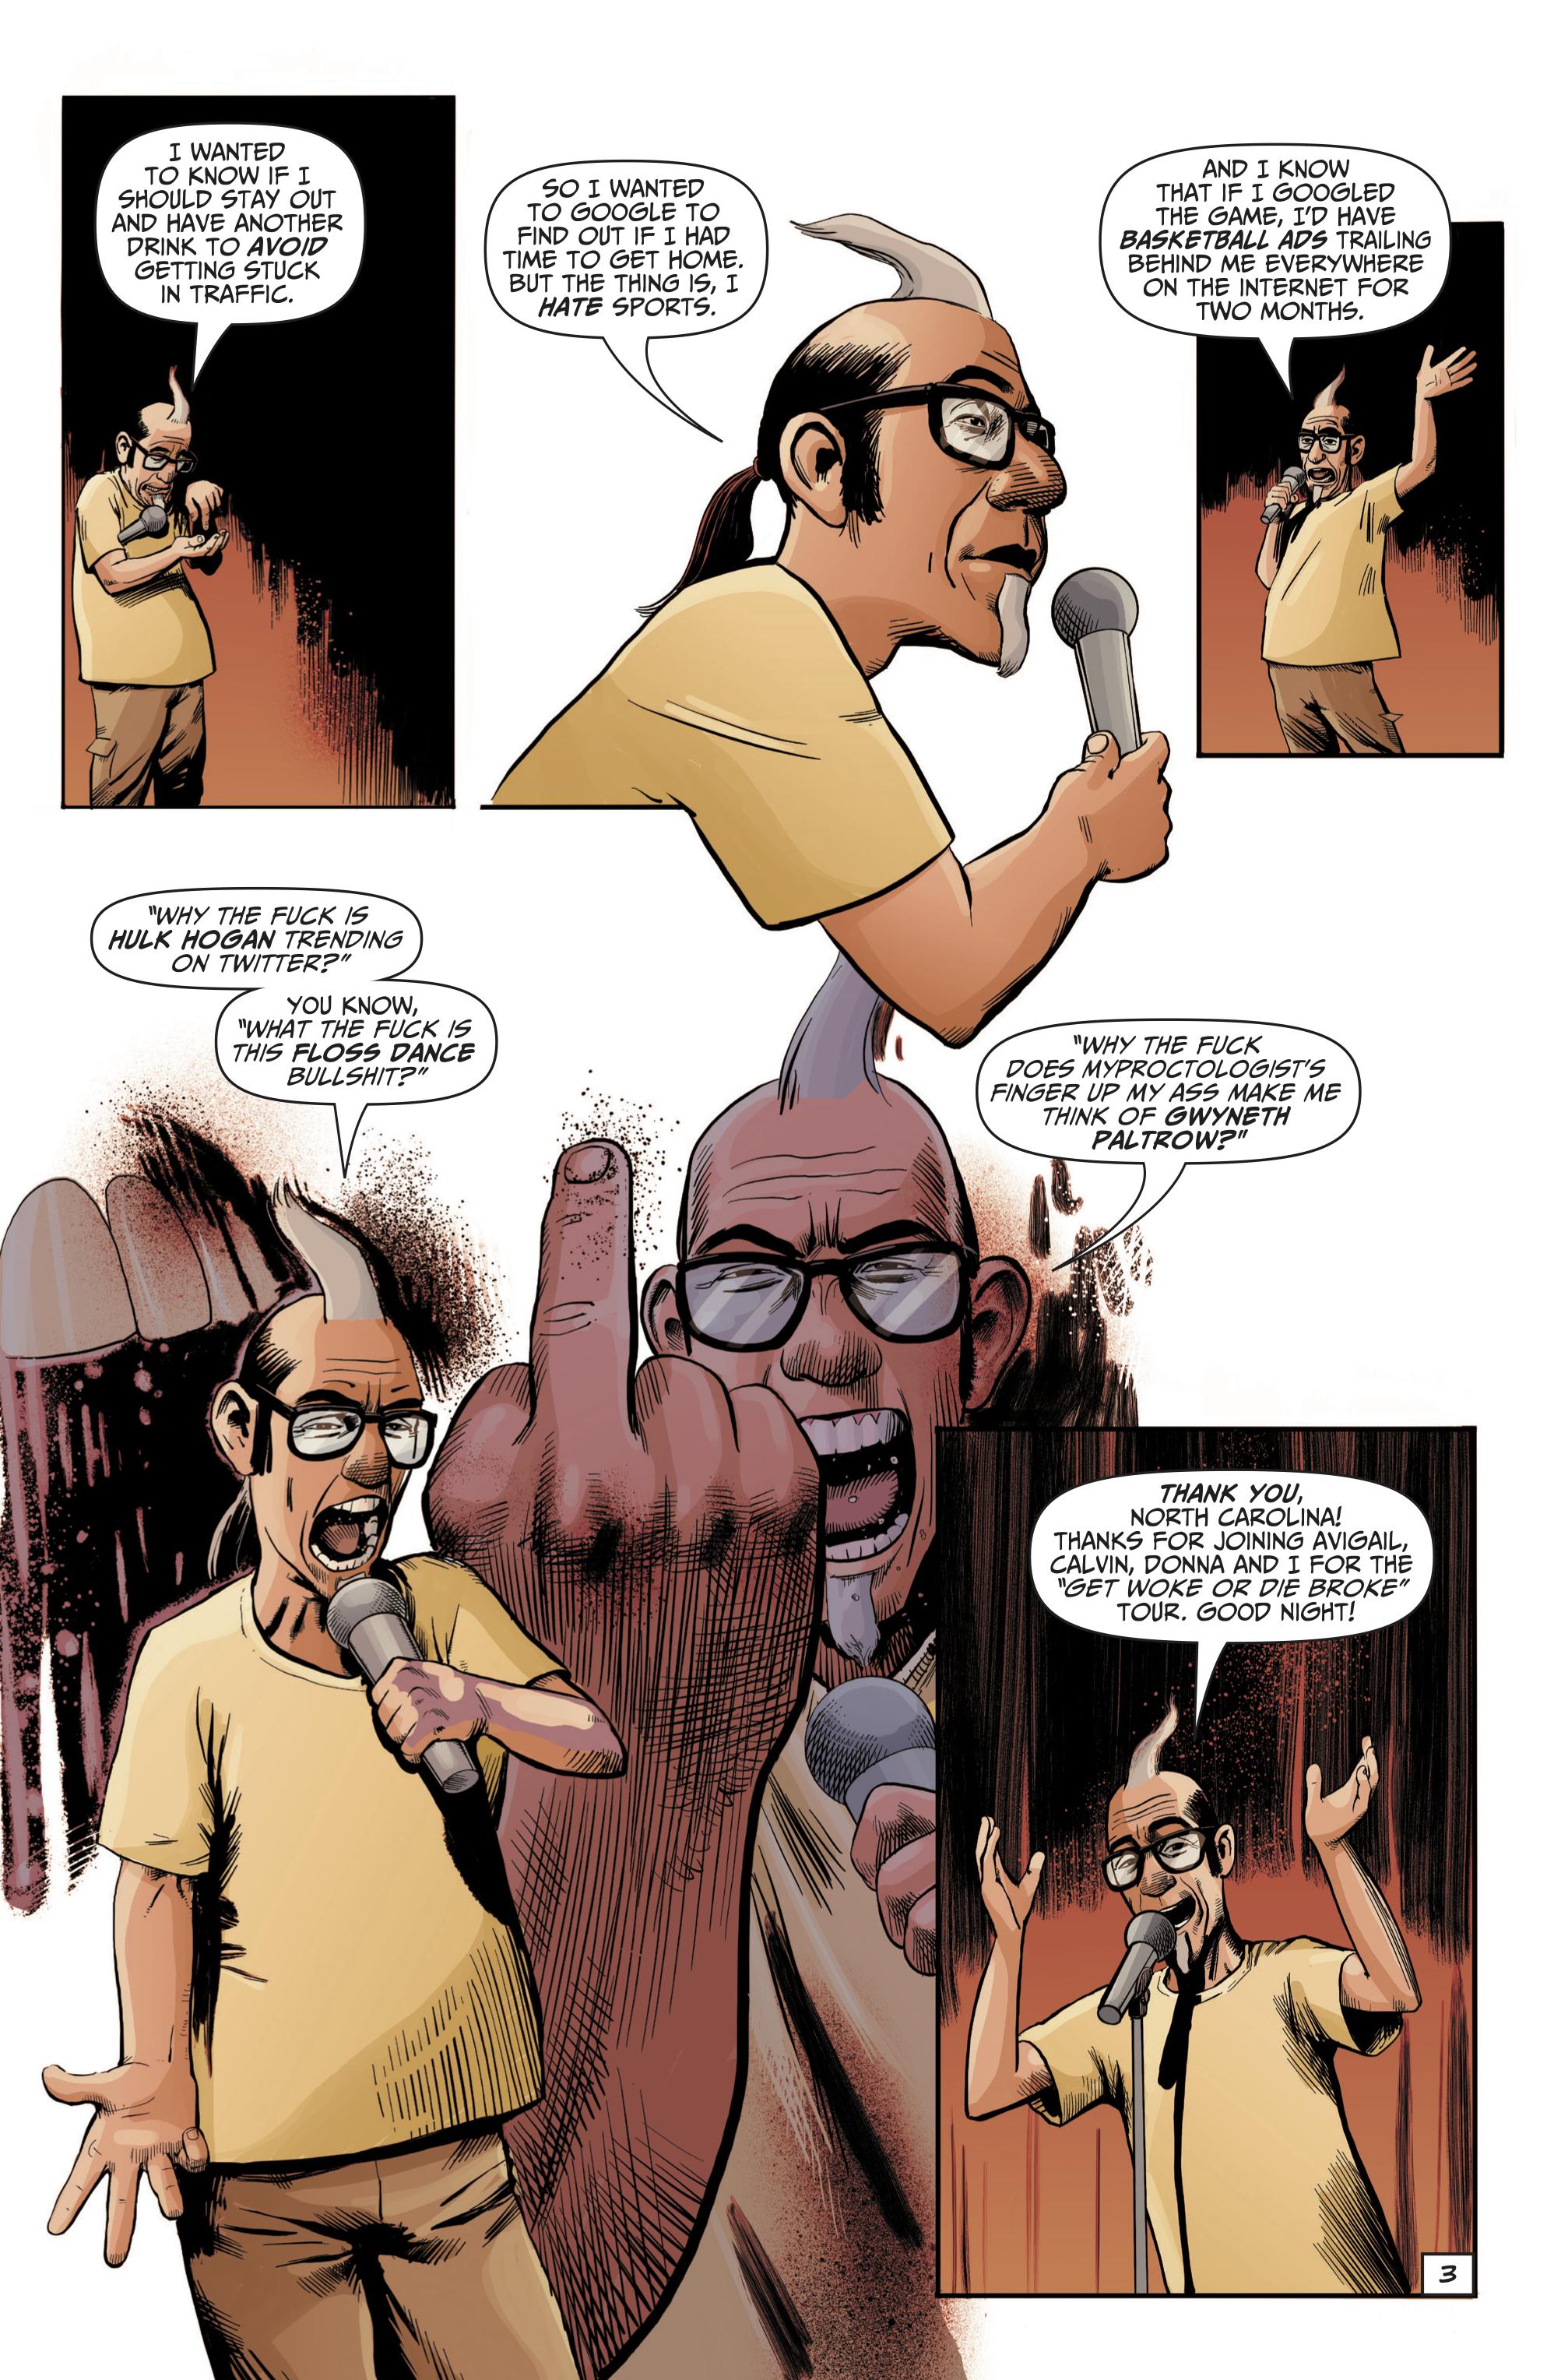 Snelson: la comedia está muriendo # 1